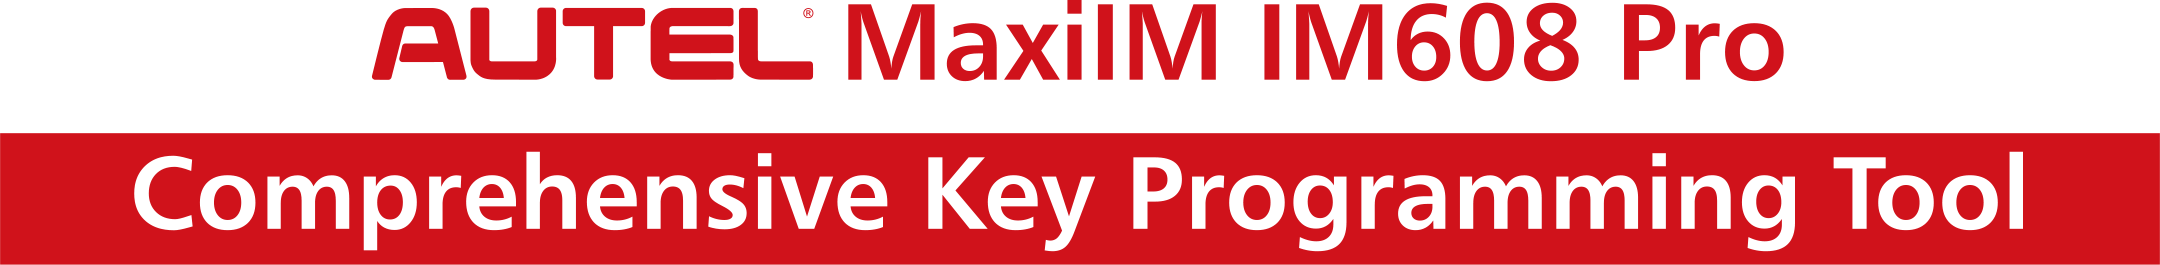 key-programming-tool